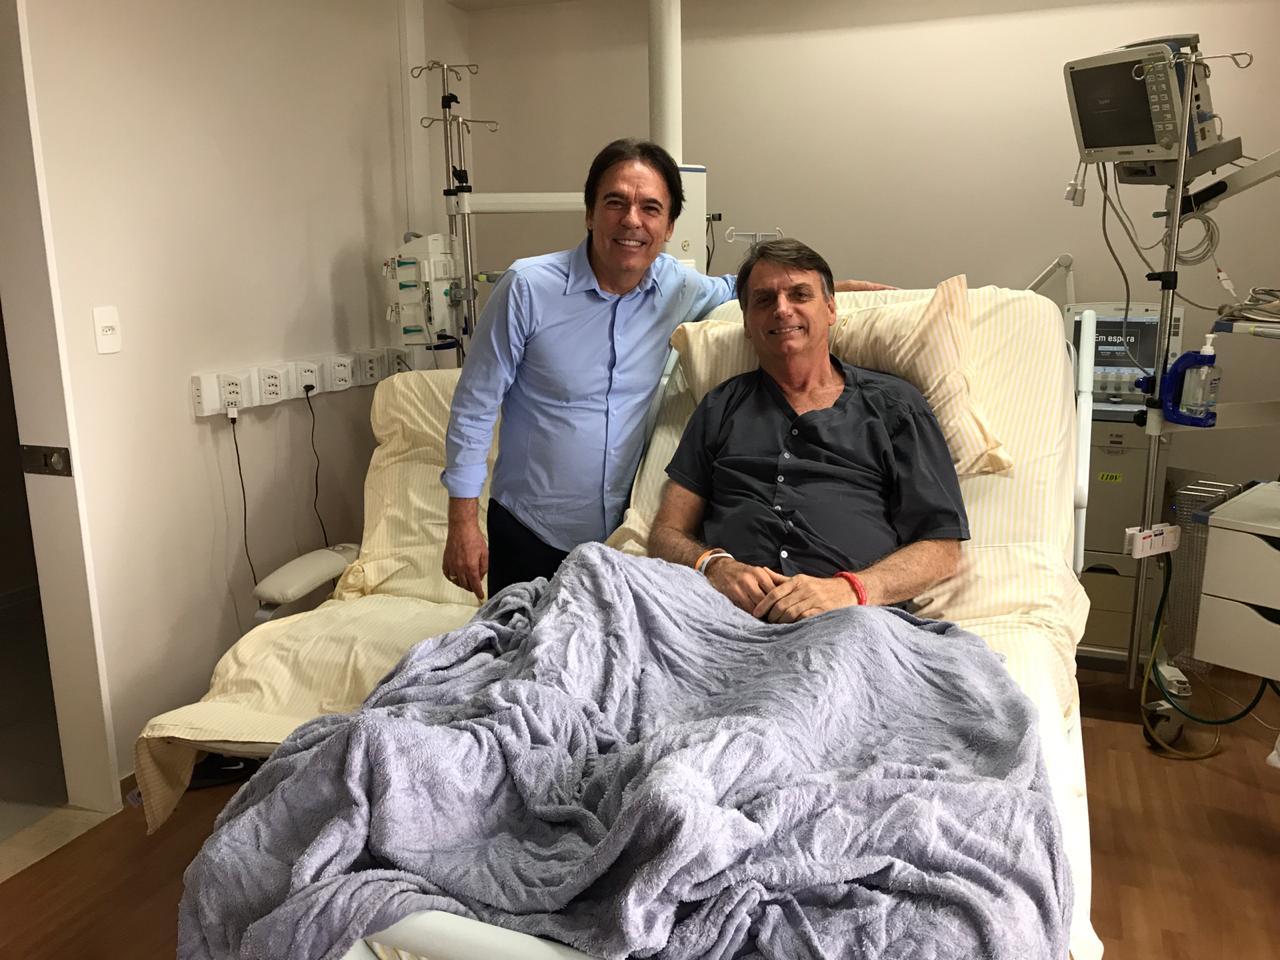 Bispo Rodovalho visita o candidato à presidência da República, Jair Bolsonaro